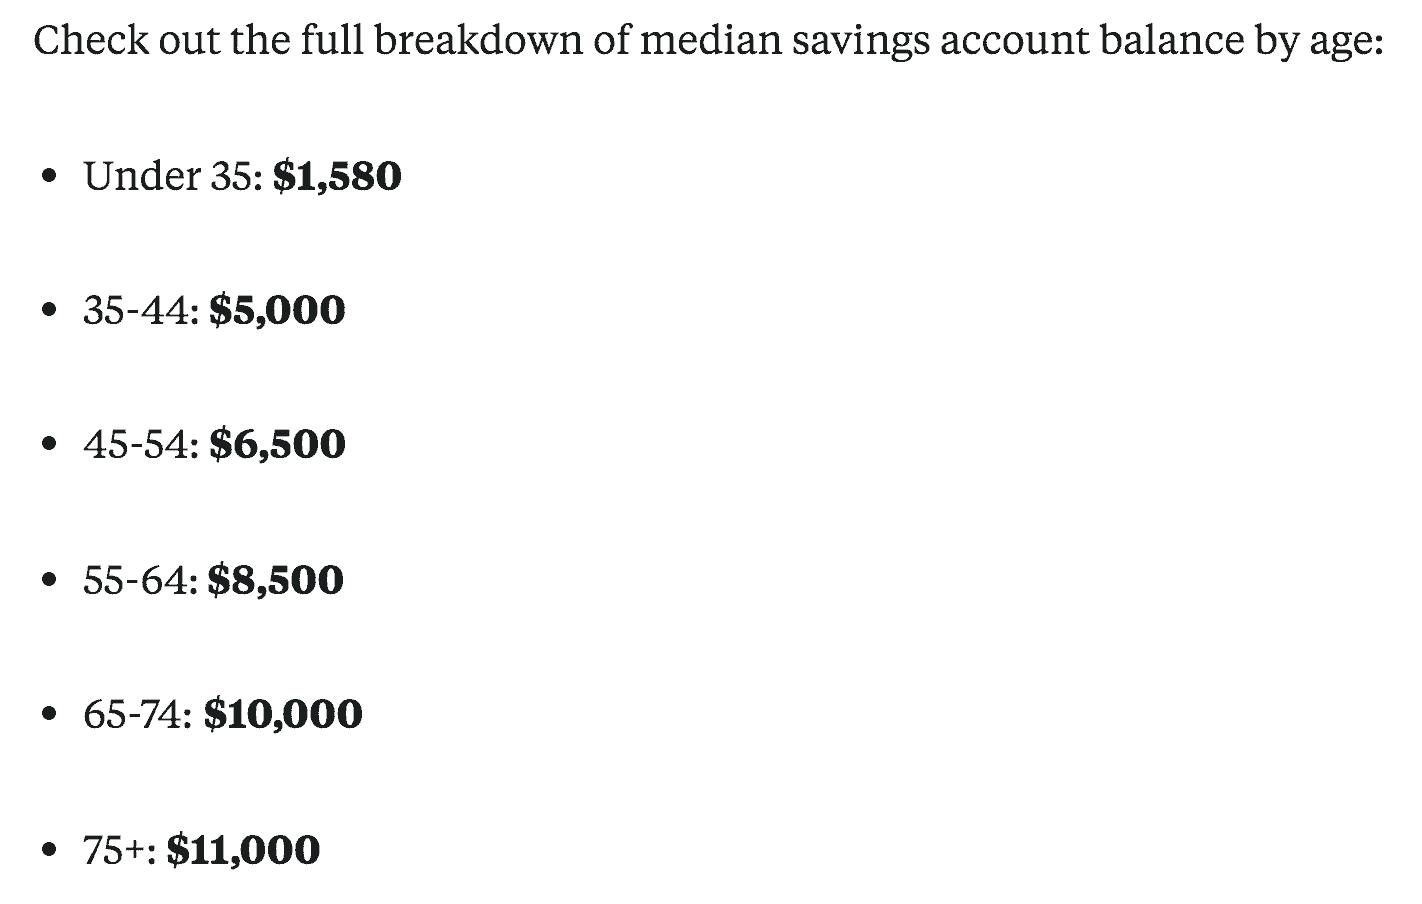 Average savings account balance by age